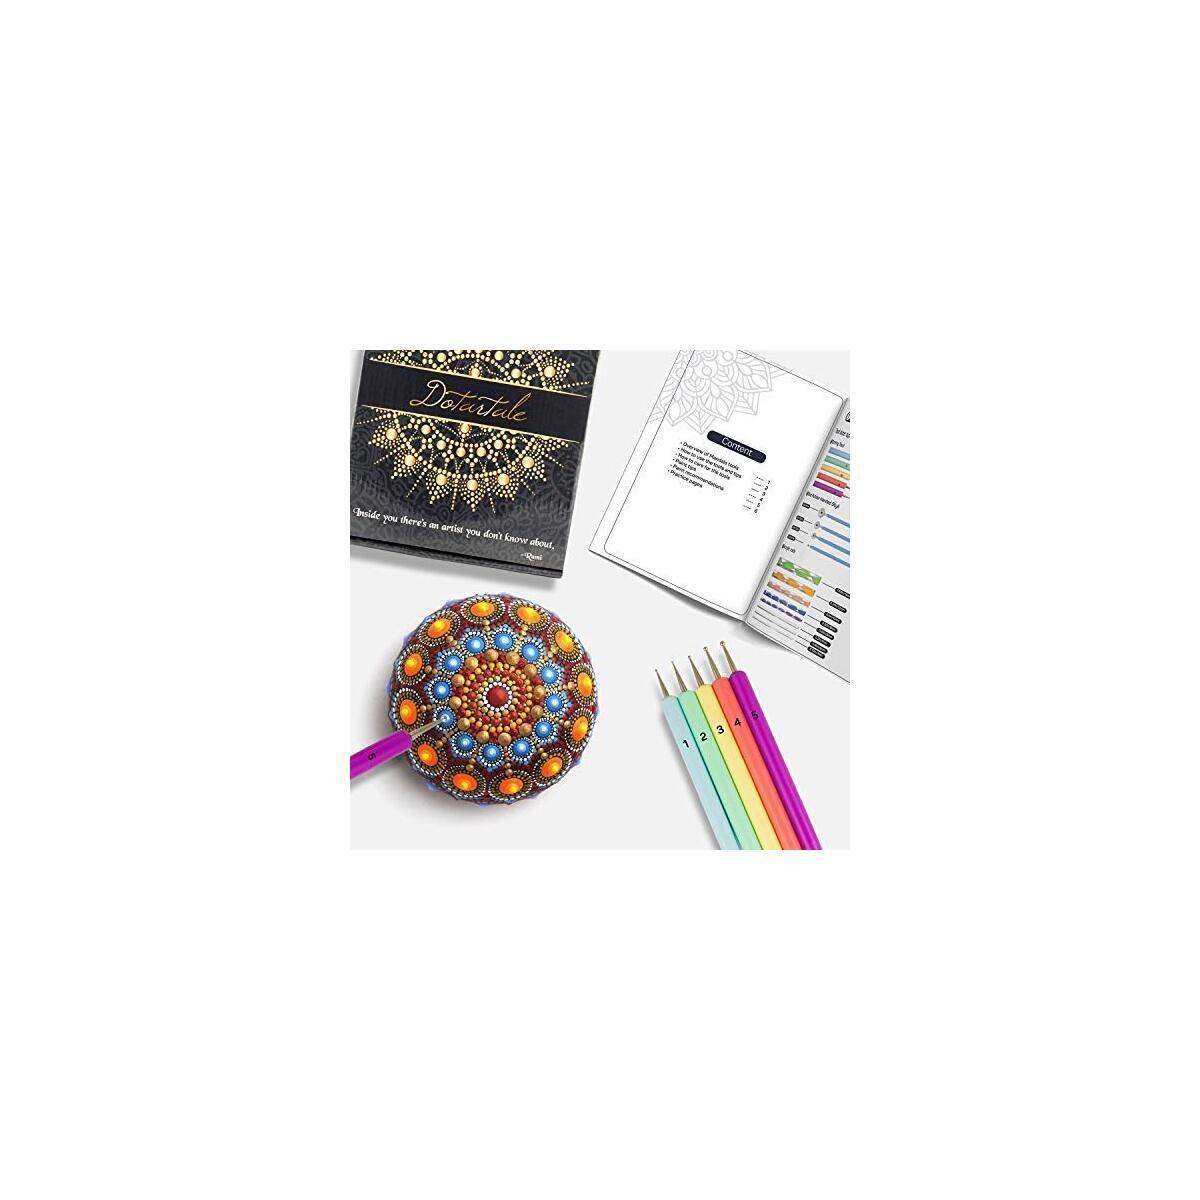 Mandala Dotting Tools Set - (34 PCS) Acrylic Paint Pens for Rock Painting, Dot Tools, Painting Tray, Storage Bag, Gemstone Stickers